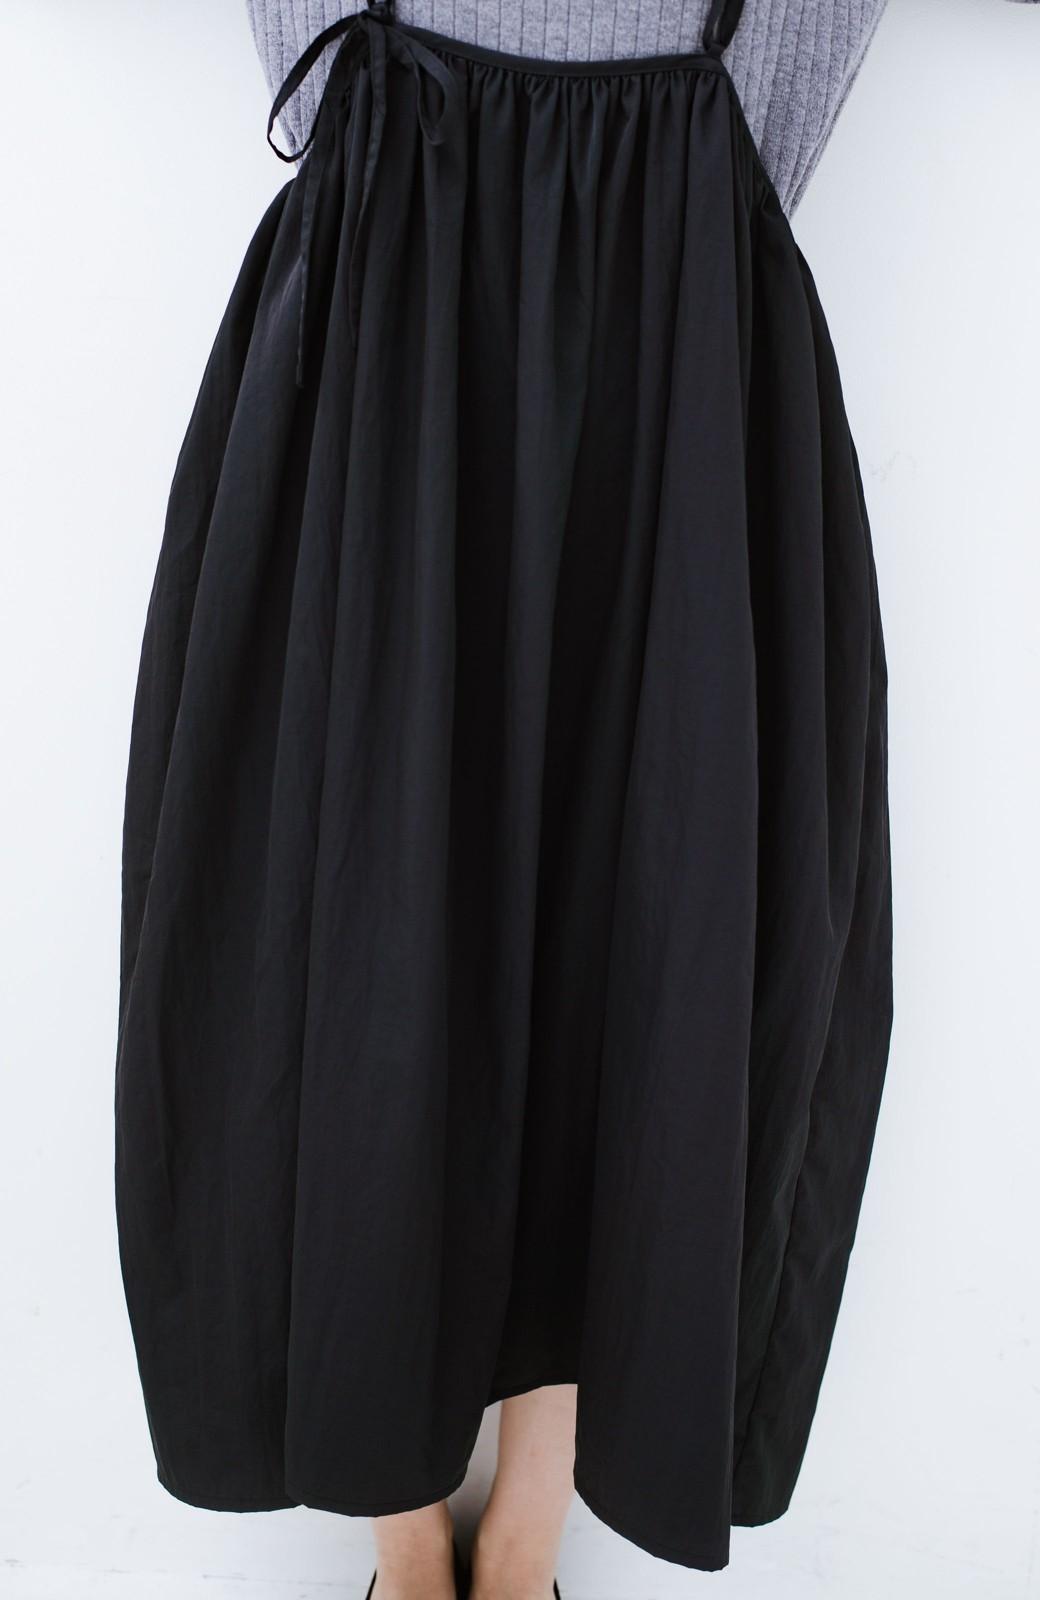 haco! 女の子バンザイ!プロジェクト【ブルー期】 ニットですら重ね着できる安心さ ゆったりギャザーキャミワンピ <ブラック>の商品写真12